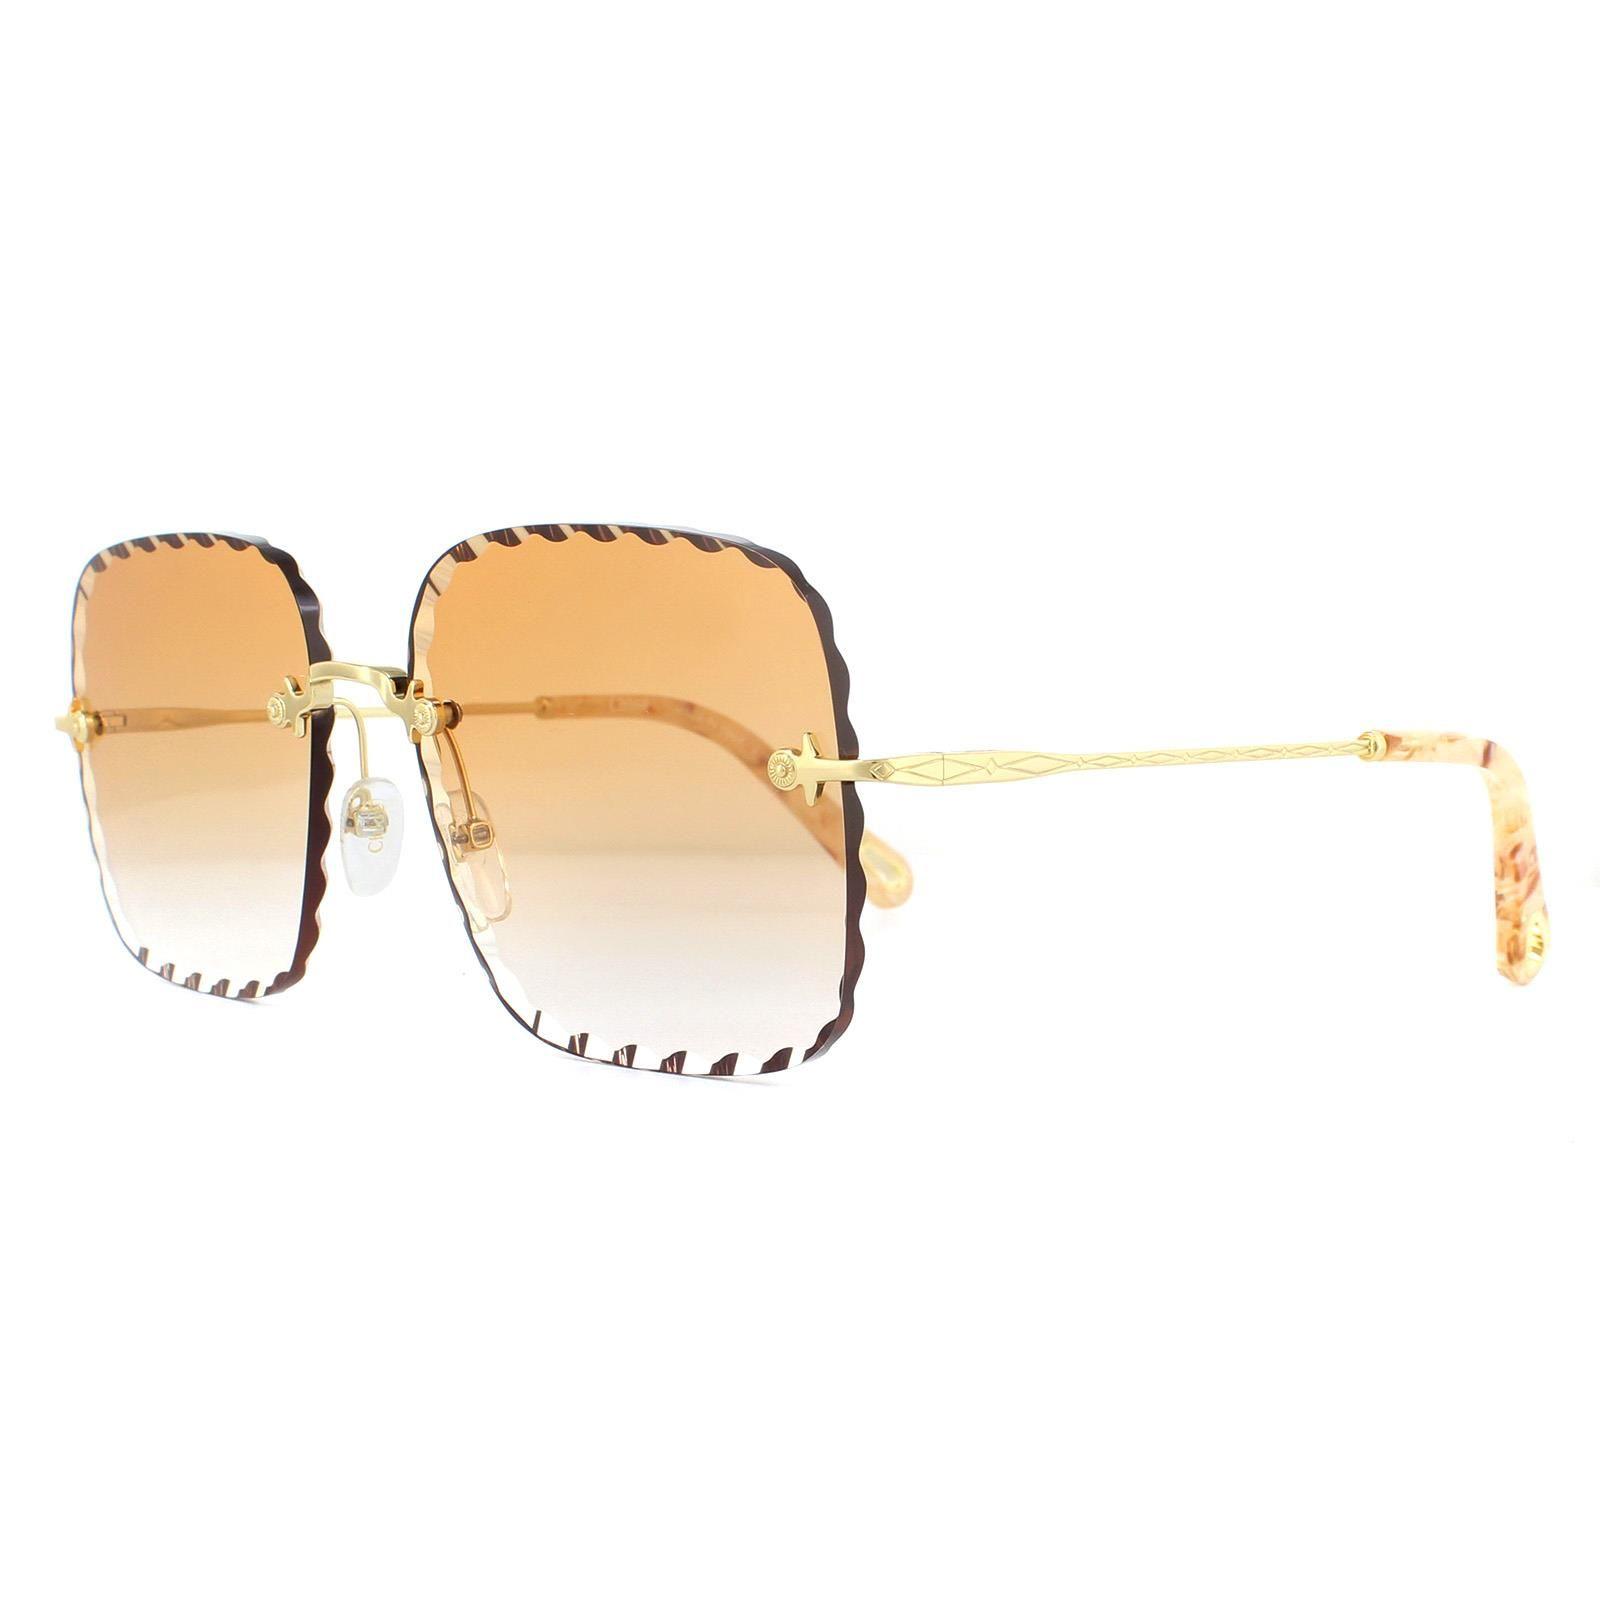 Chloe Sunglasses CE161S 862 Gold Brown Peach Gradient